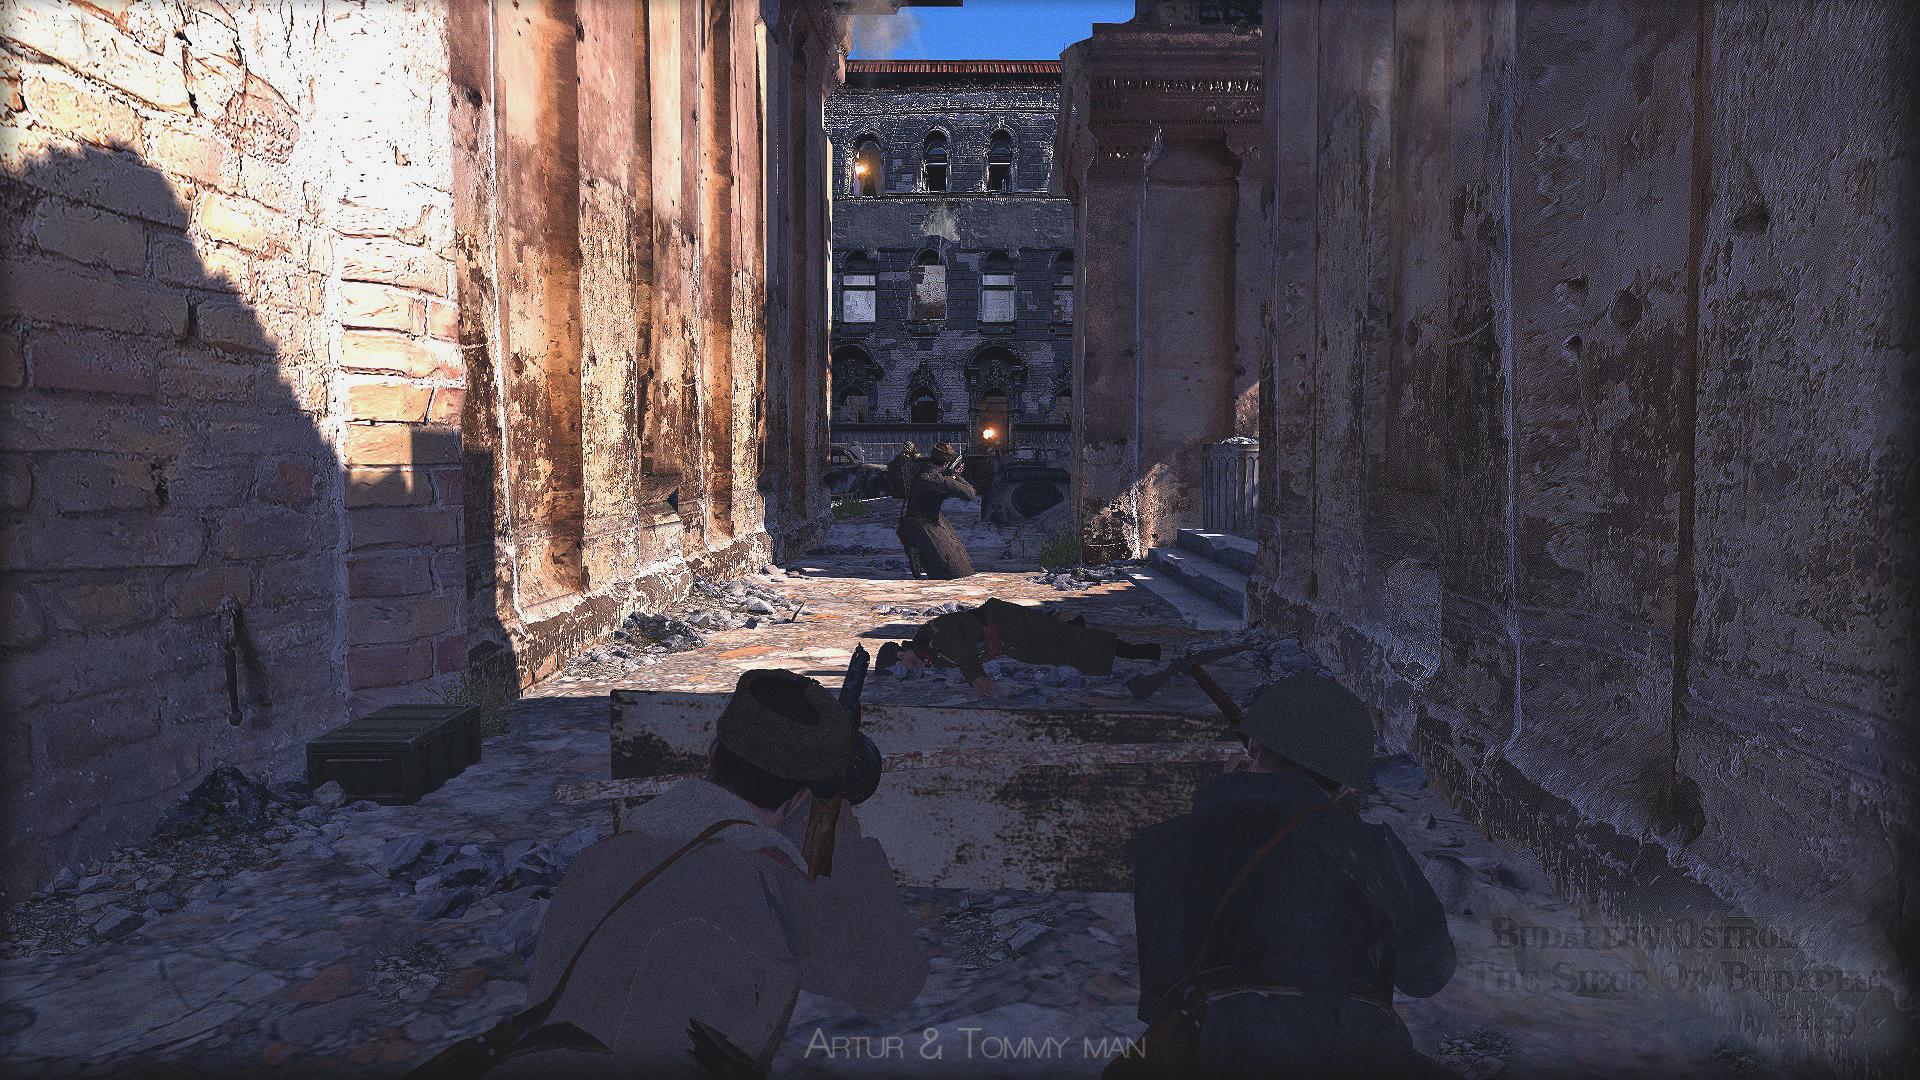 Harcok Budapesten 1944-45, Jatek ostrom,epic,